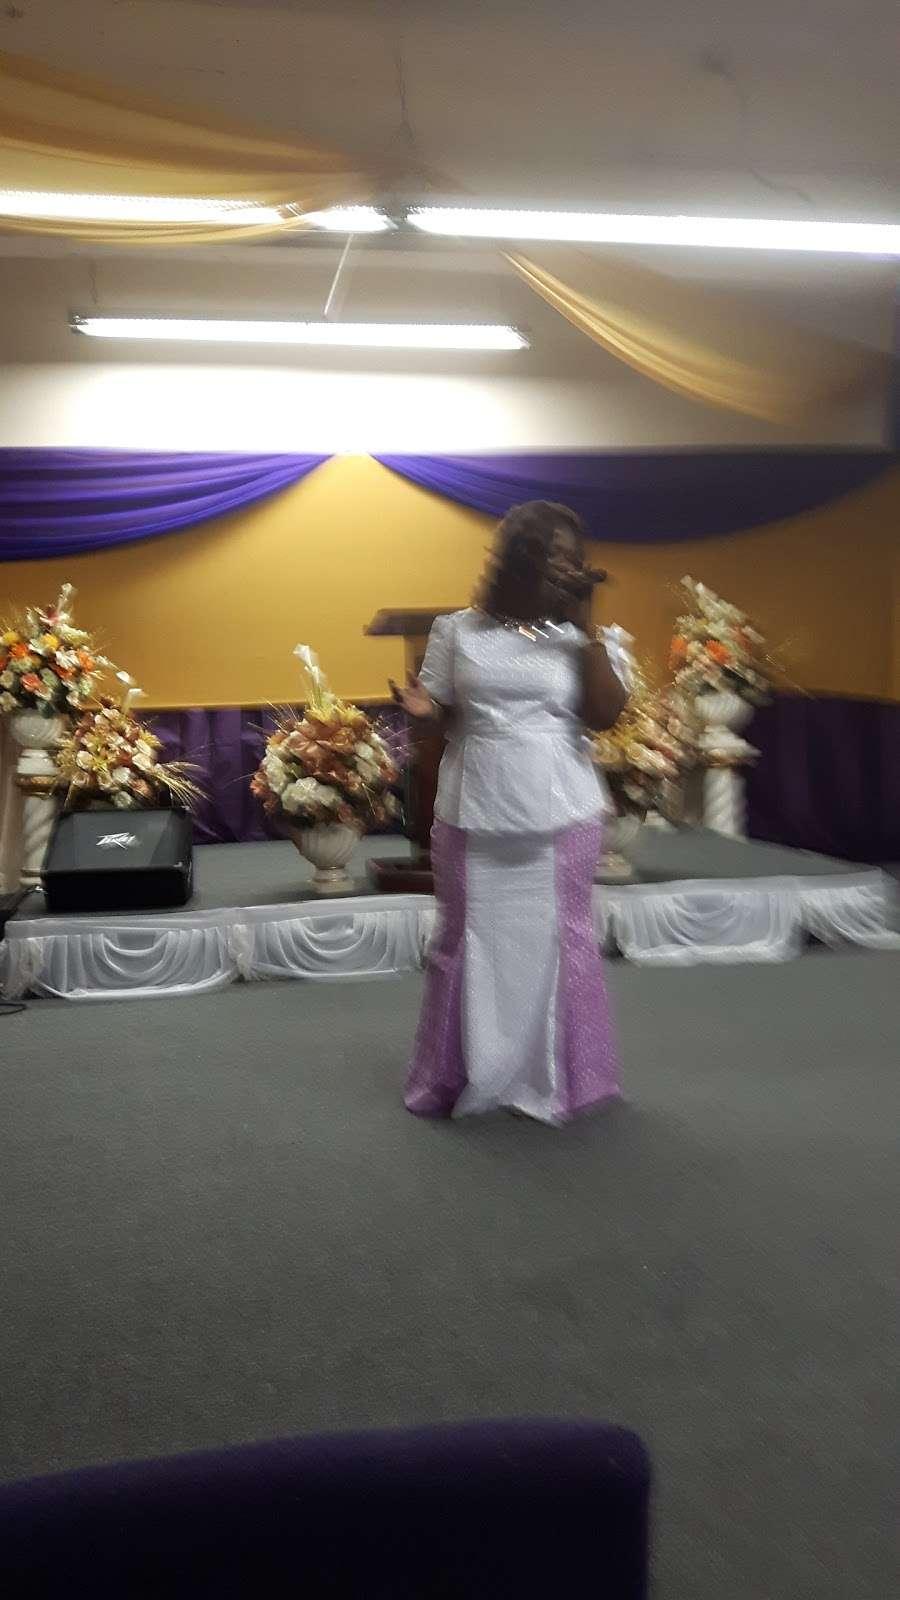 Glad Tidings Assembly of God - church  | Photo 2 of 2 | Address: 2 Van Cortlandt Ave E, Bronx, NY 10468, USA | Phone: (718) 367-4040